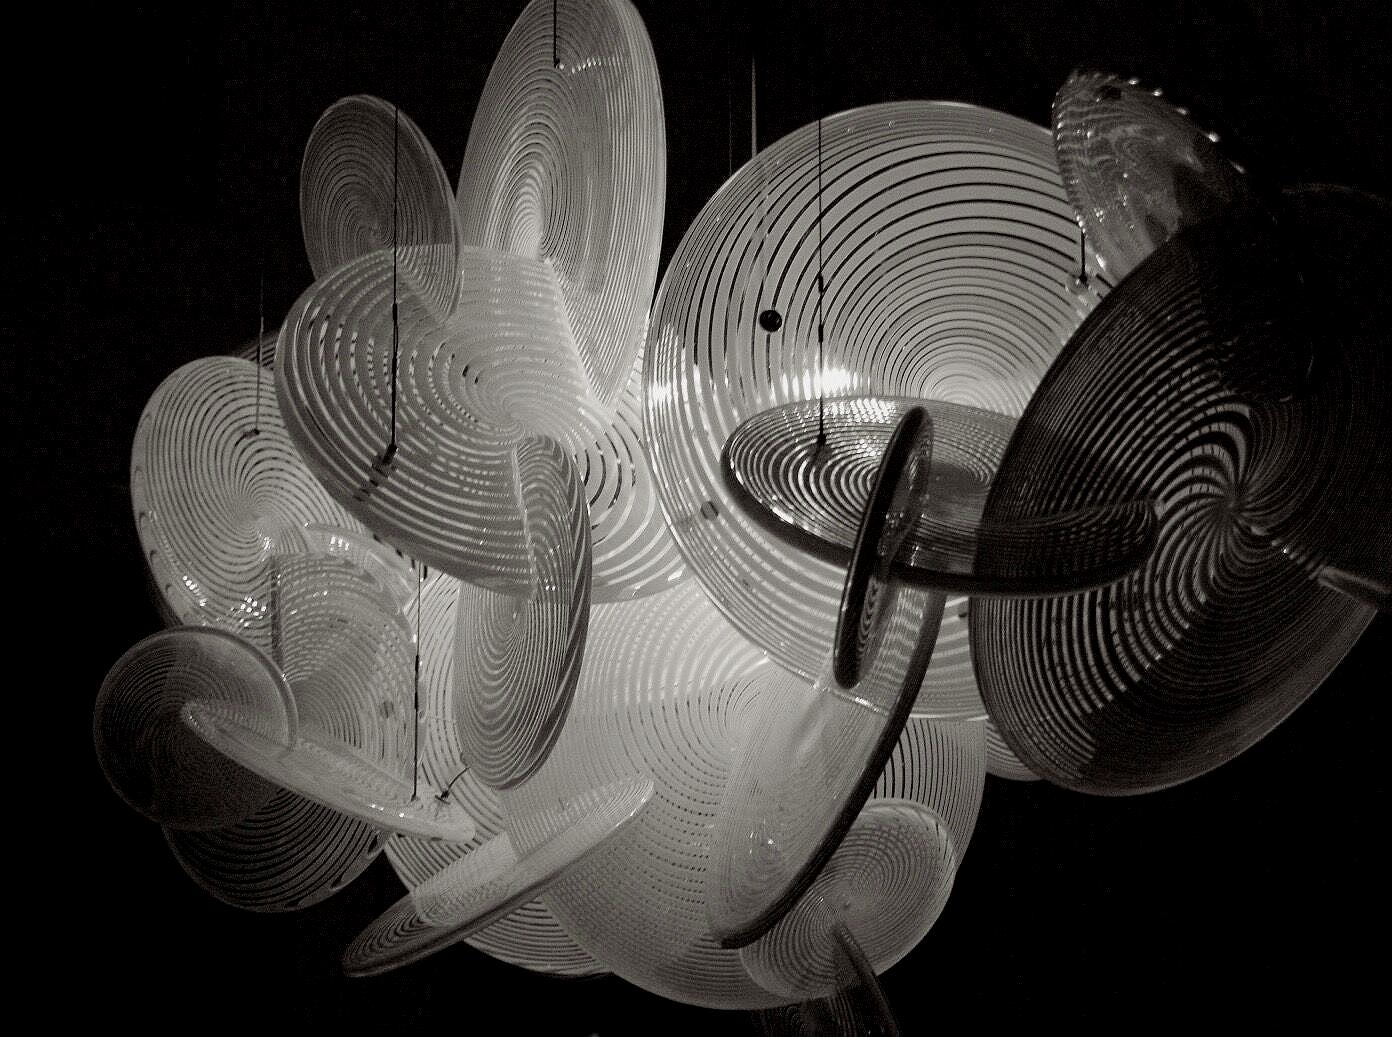 "Venetian Hypnotic Illuminated Sculpture  Hand Blown Glass Venetian Discs, Stainless Steel, Light Dimensions: 56"" wide x 32""H x 62"" Drop"